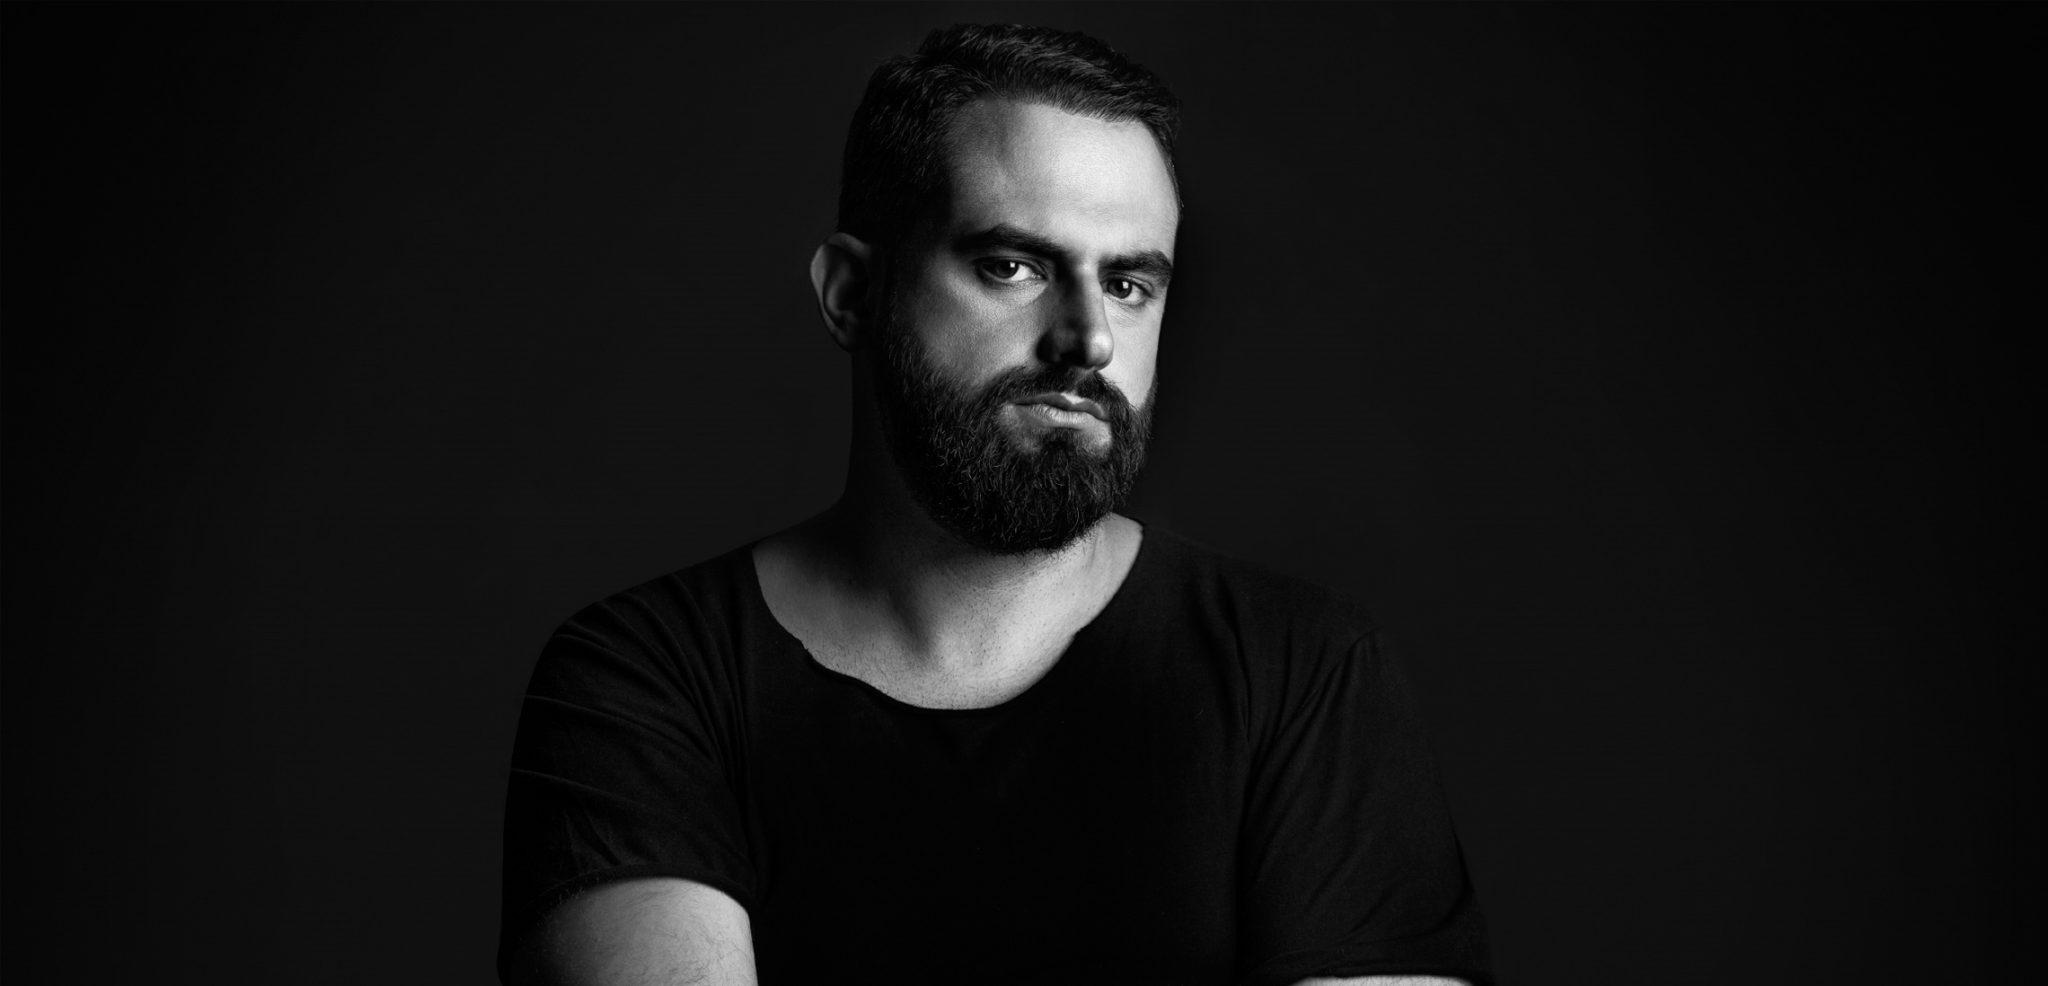 MIhalis Safras - Barrage EP (Incl. Russ Yallop & Secondcity Remixes) hero